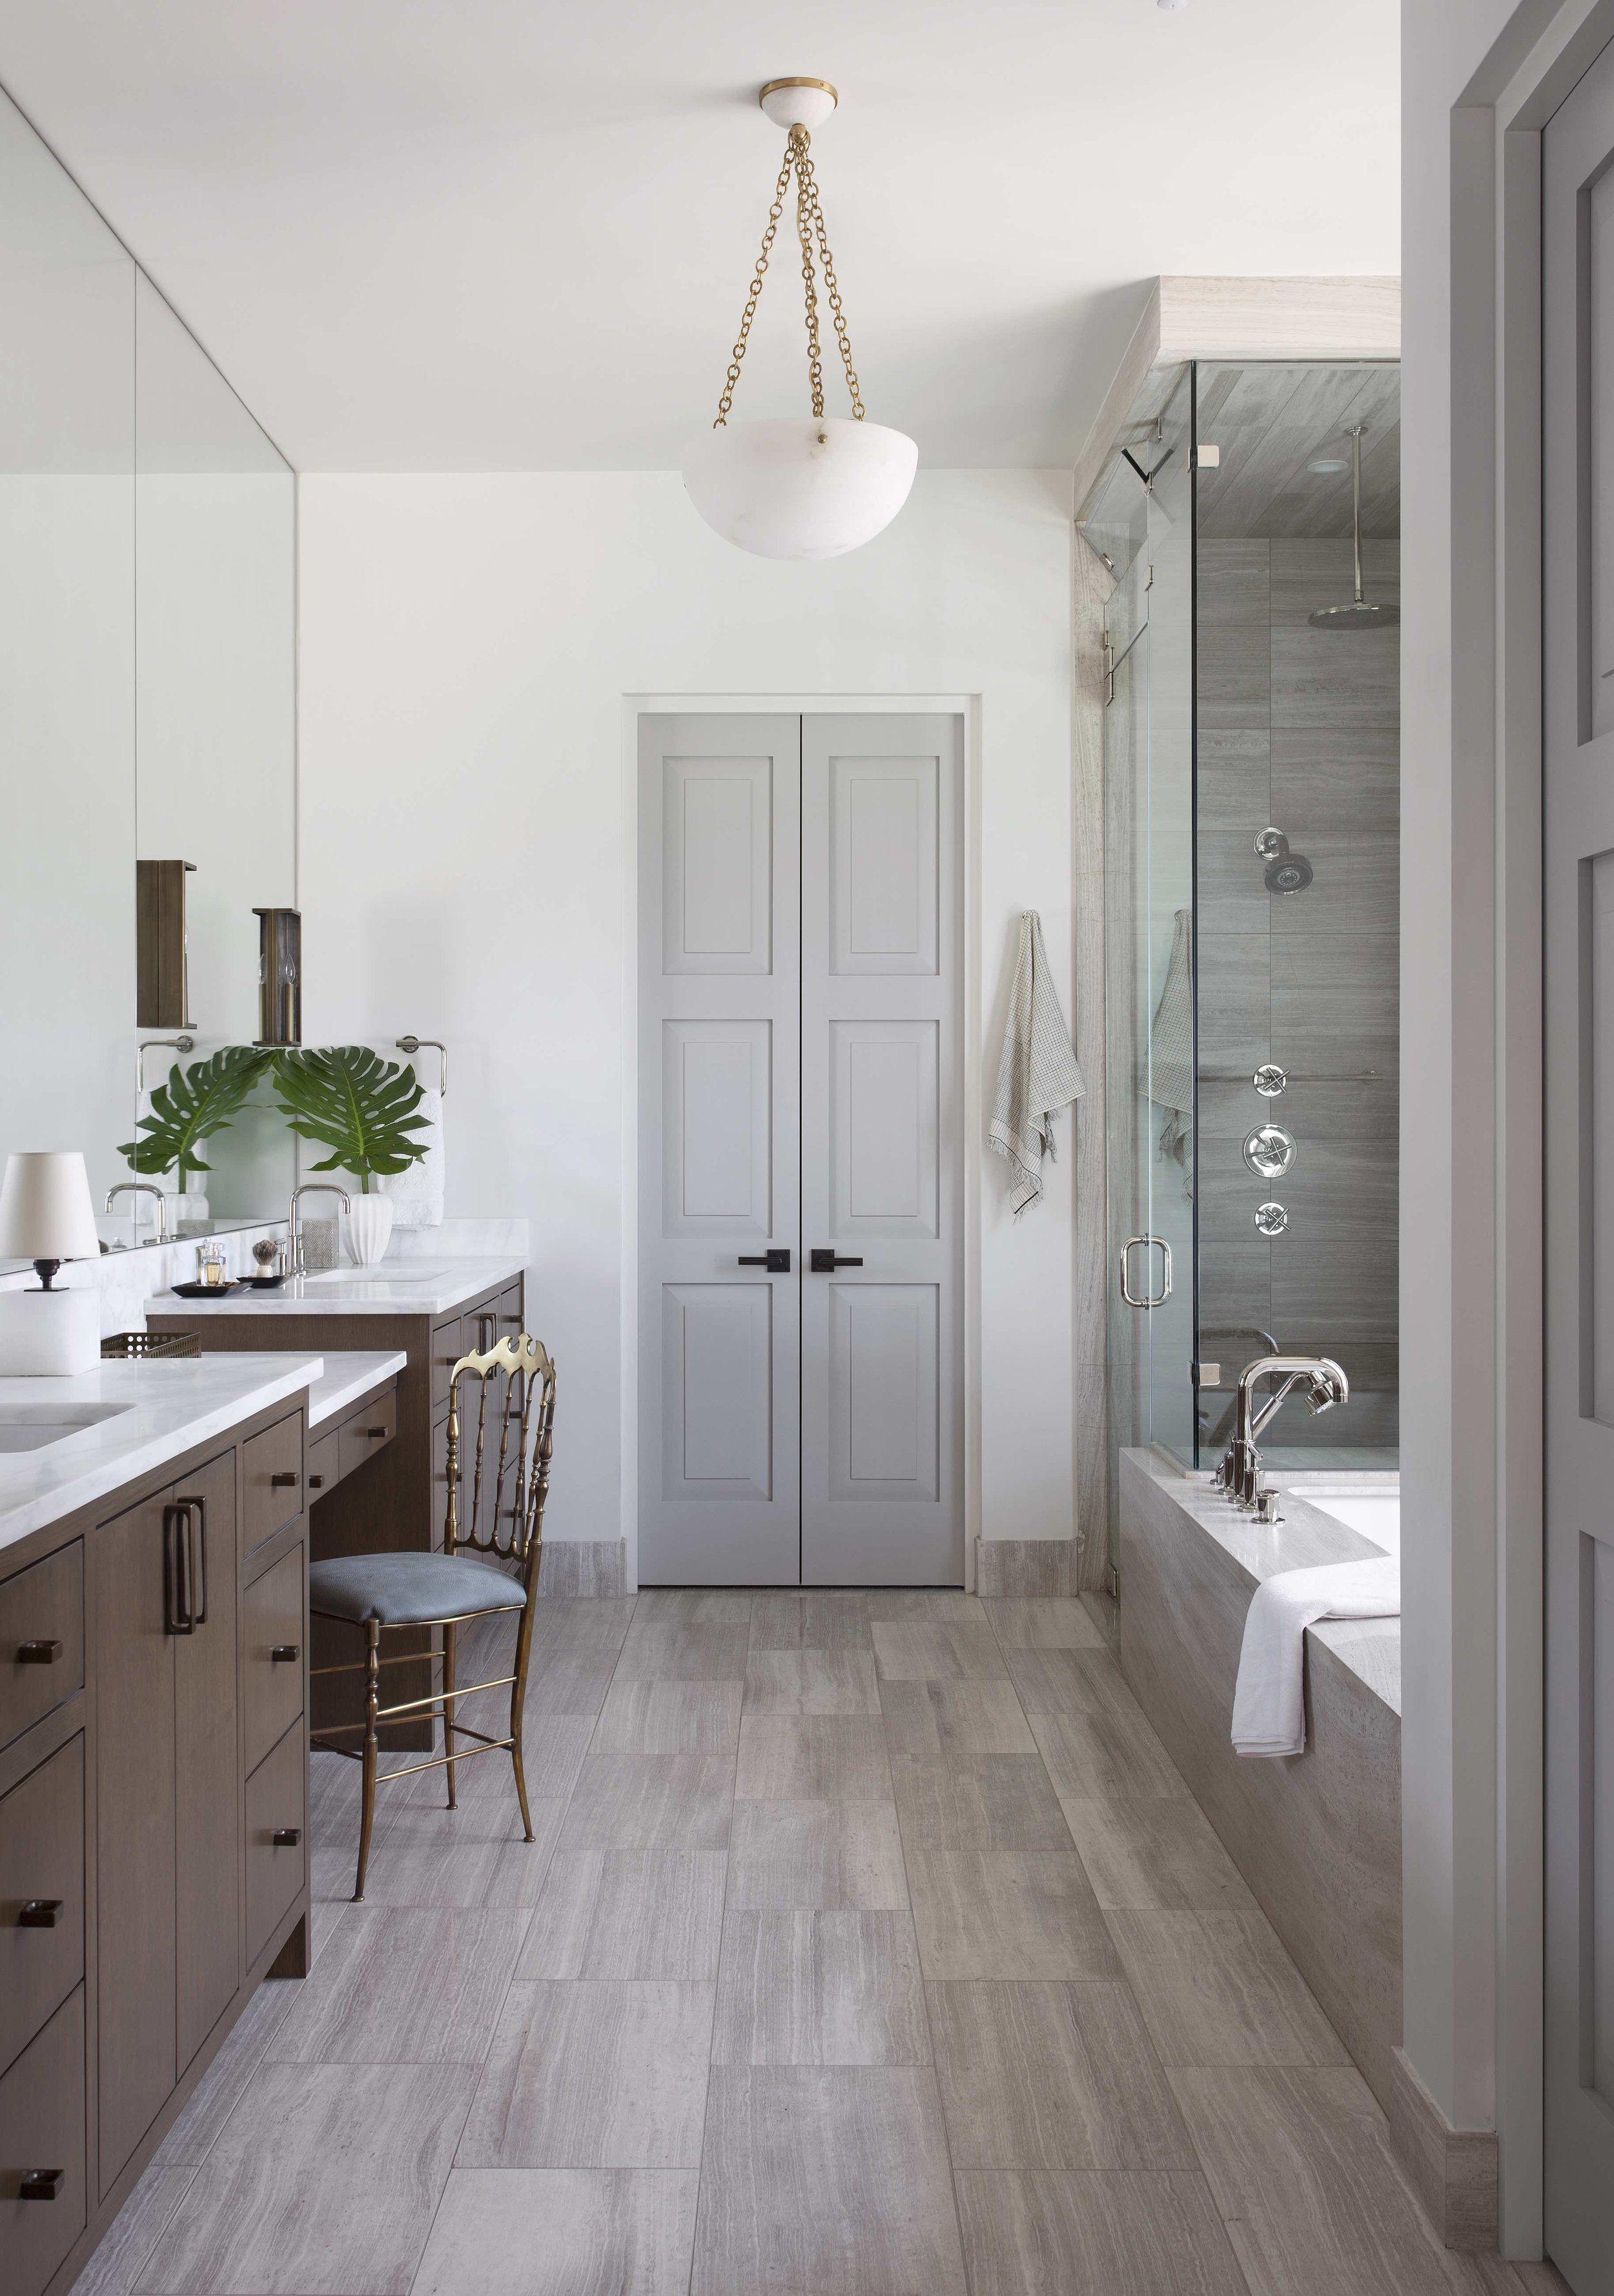 Clean Transitional Master Bathroom Studio Seiders Bathroom Remodel Cost Simple Bathroom Remodel Bathrooms Remodel